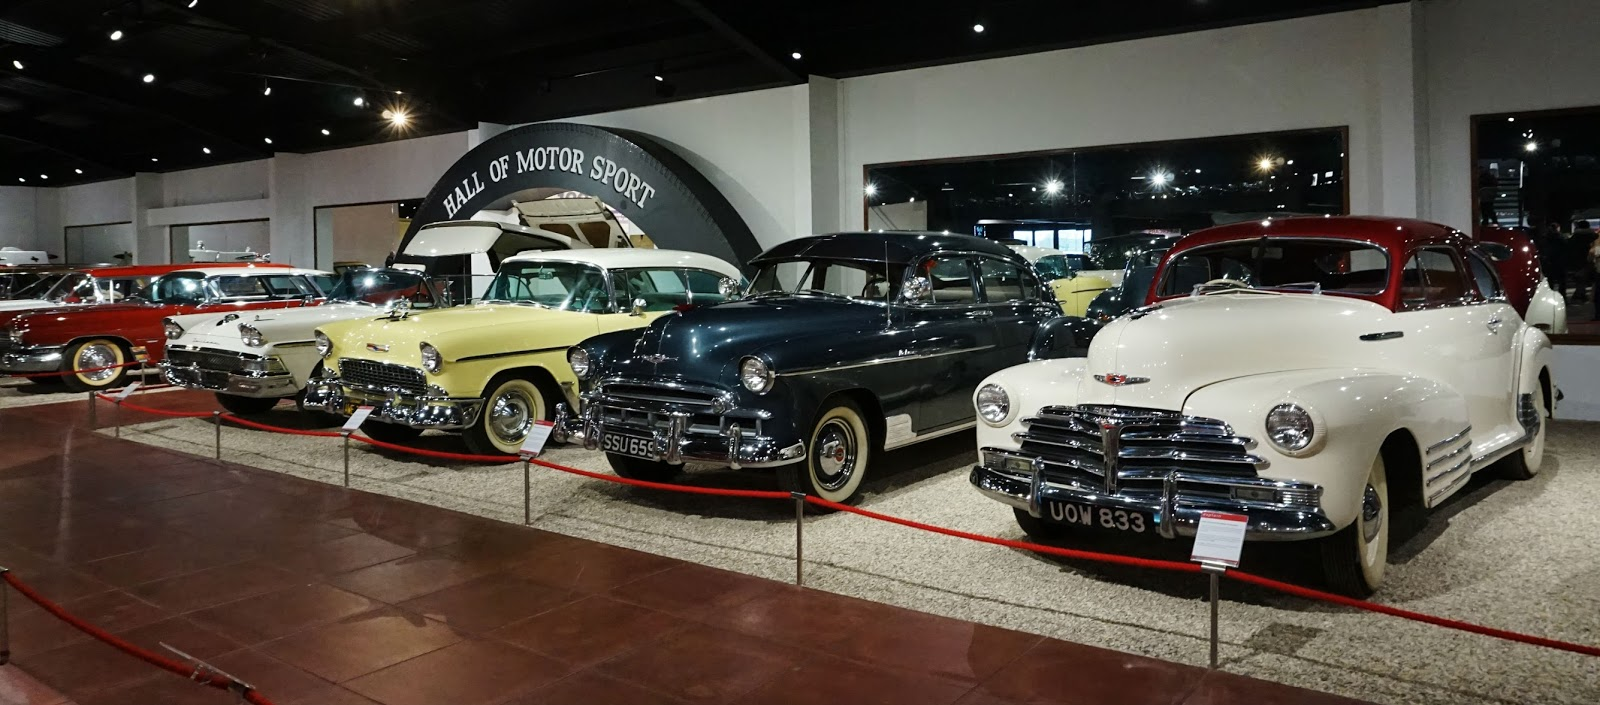 usa american super cars classic cars haynes motor museum